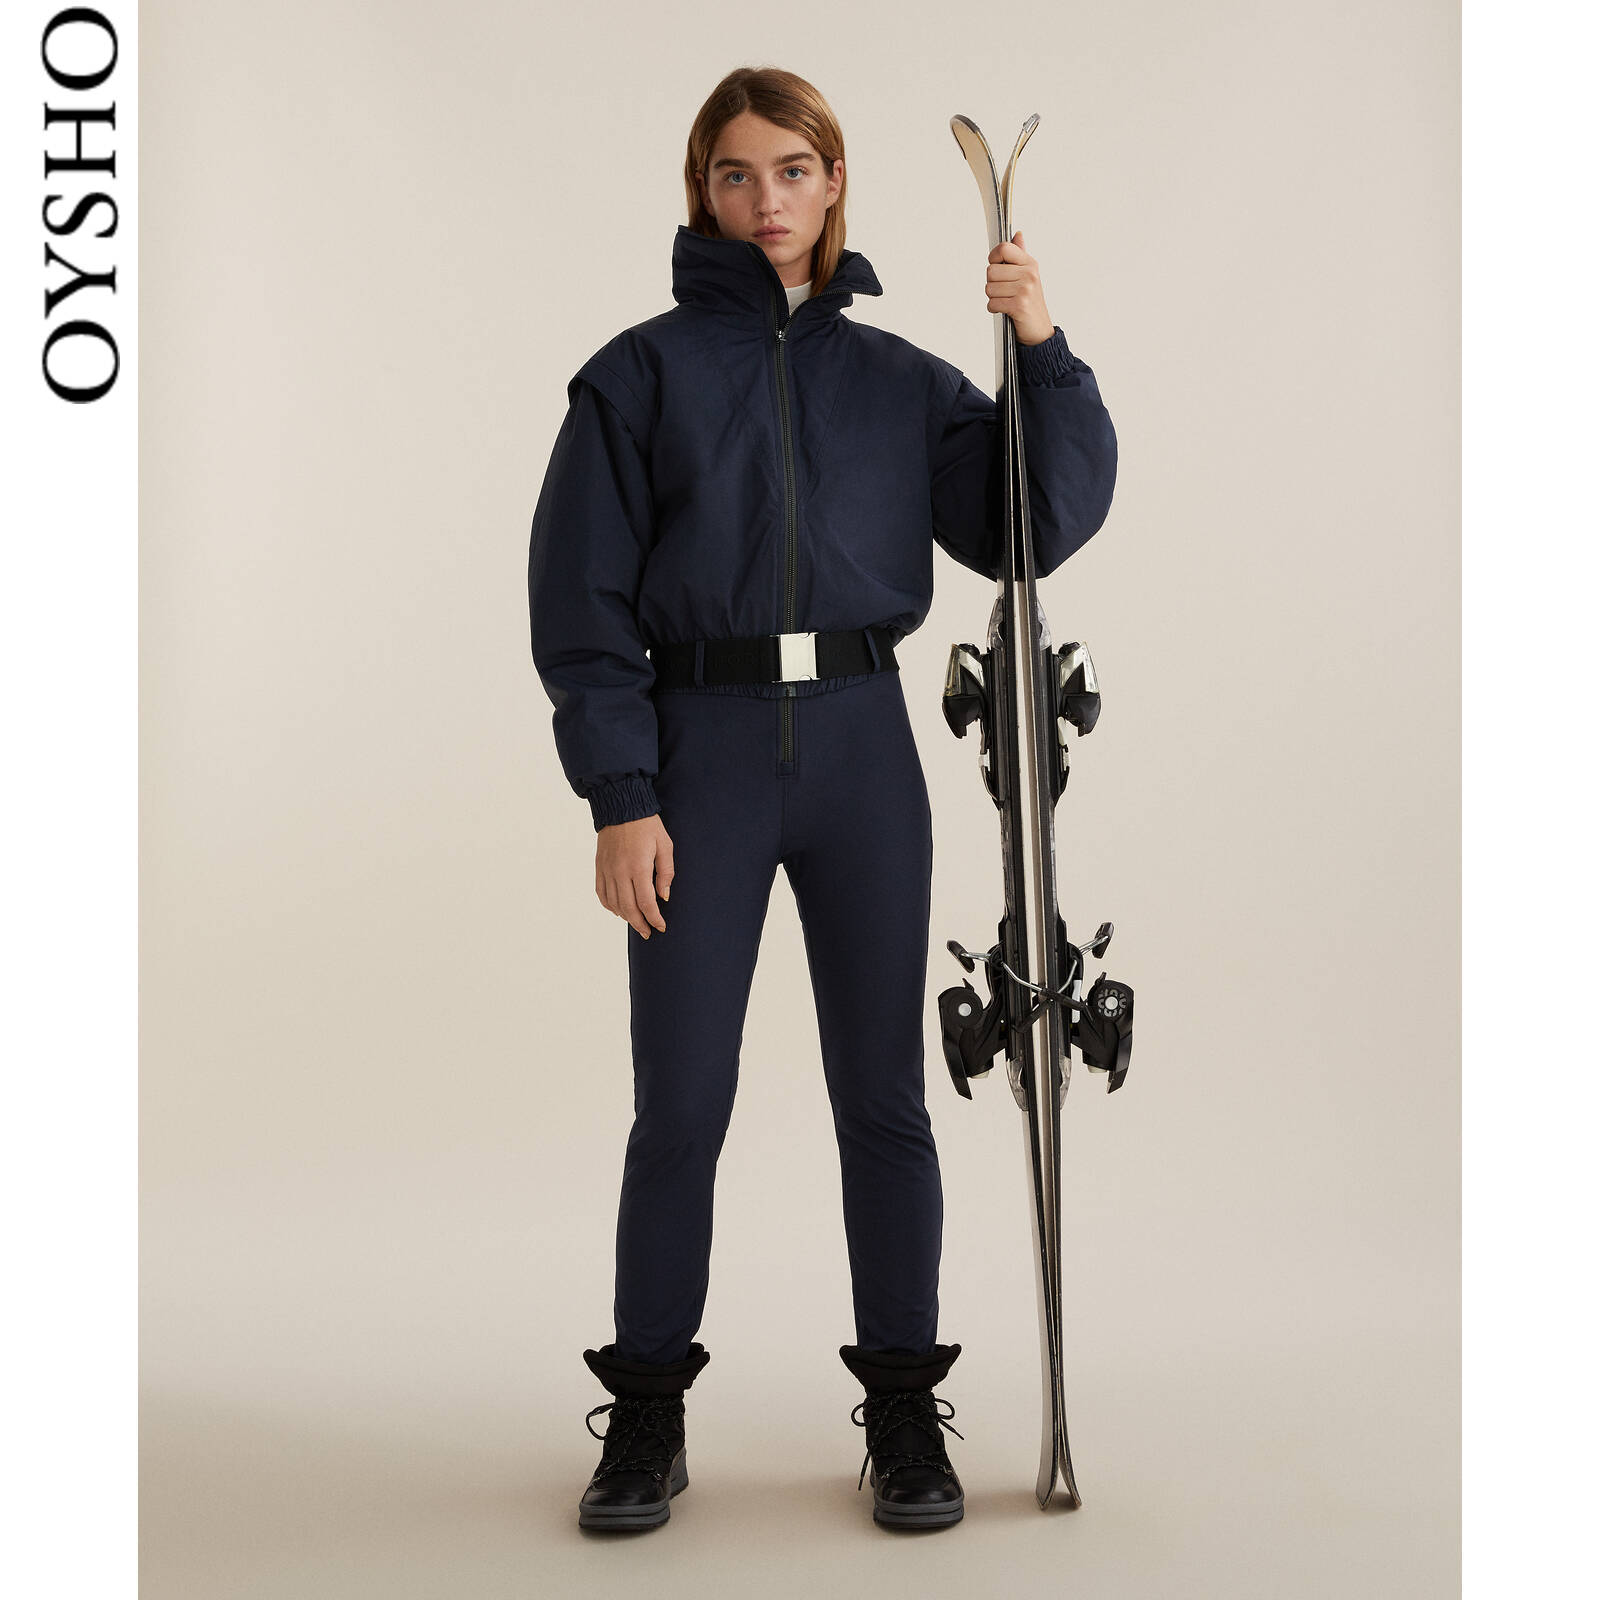 Oysho outdoor waterproof breathable warm high-necked long-sleeved ski jumpsuit sportswear 31389905401